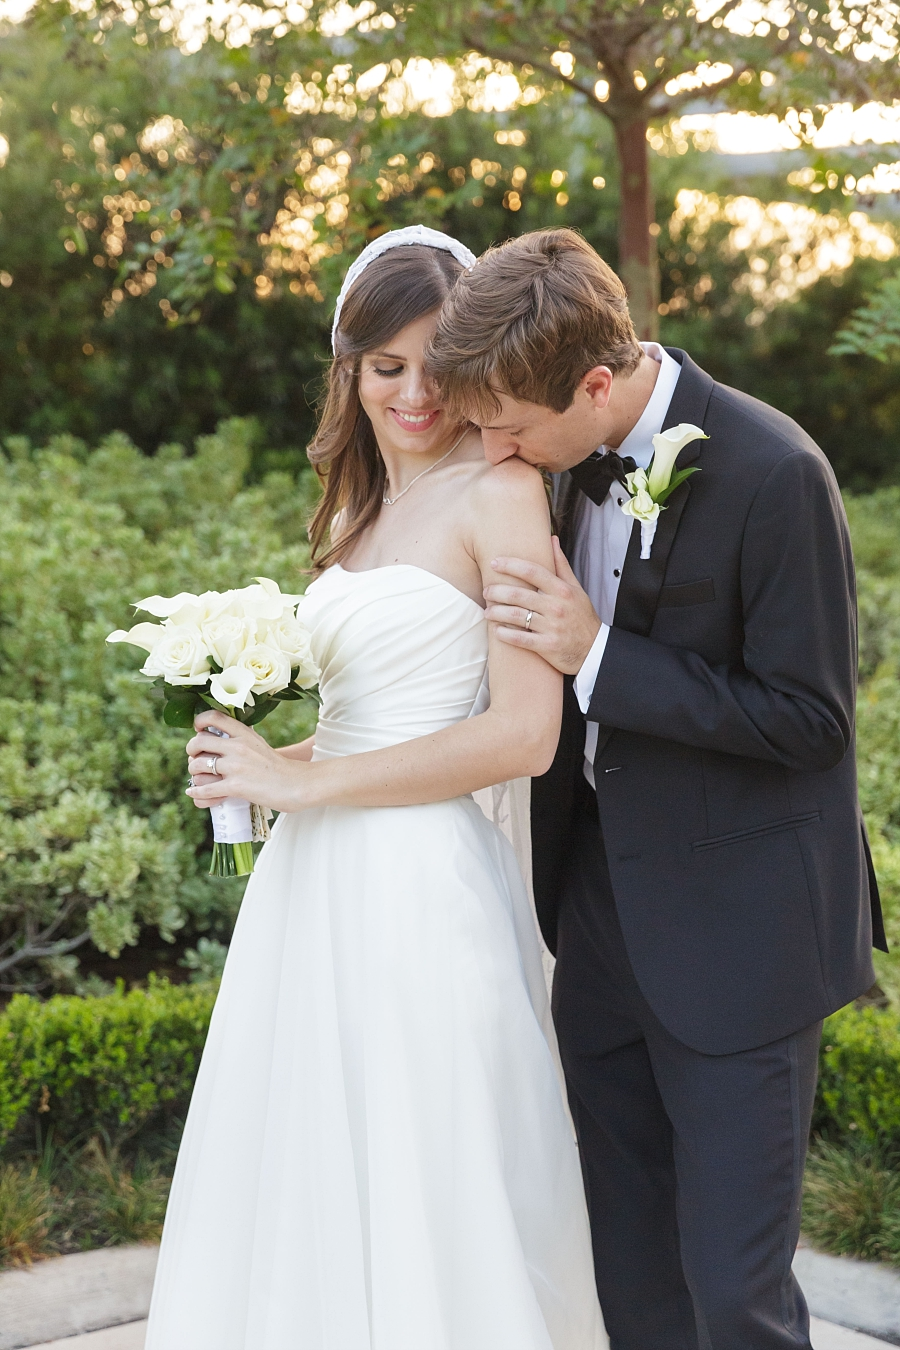 Stacy-Anderson-Photography-McGovern-Centennial-Gardens-Houston-Wedding-Photographer_0061.jpg